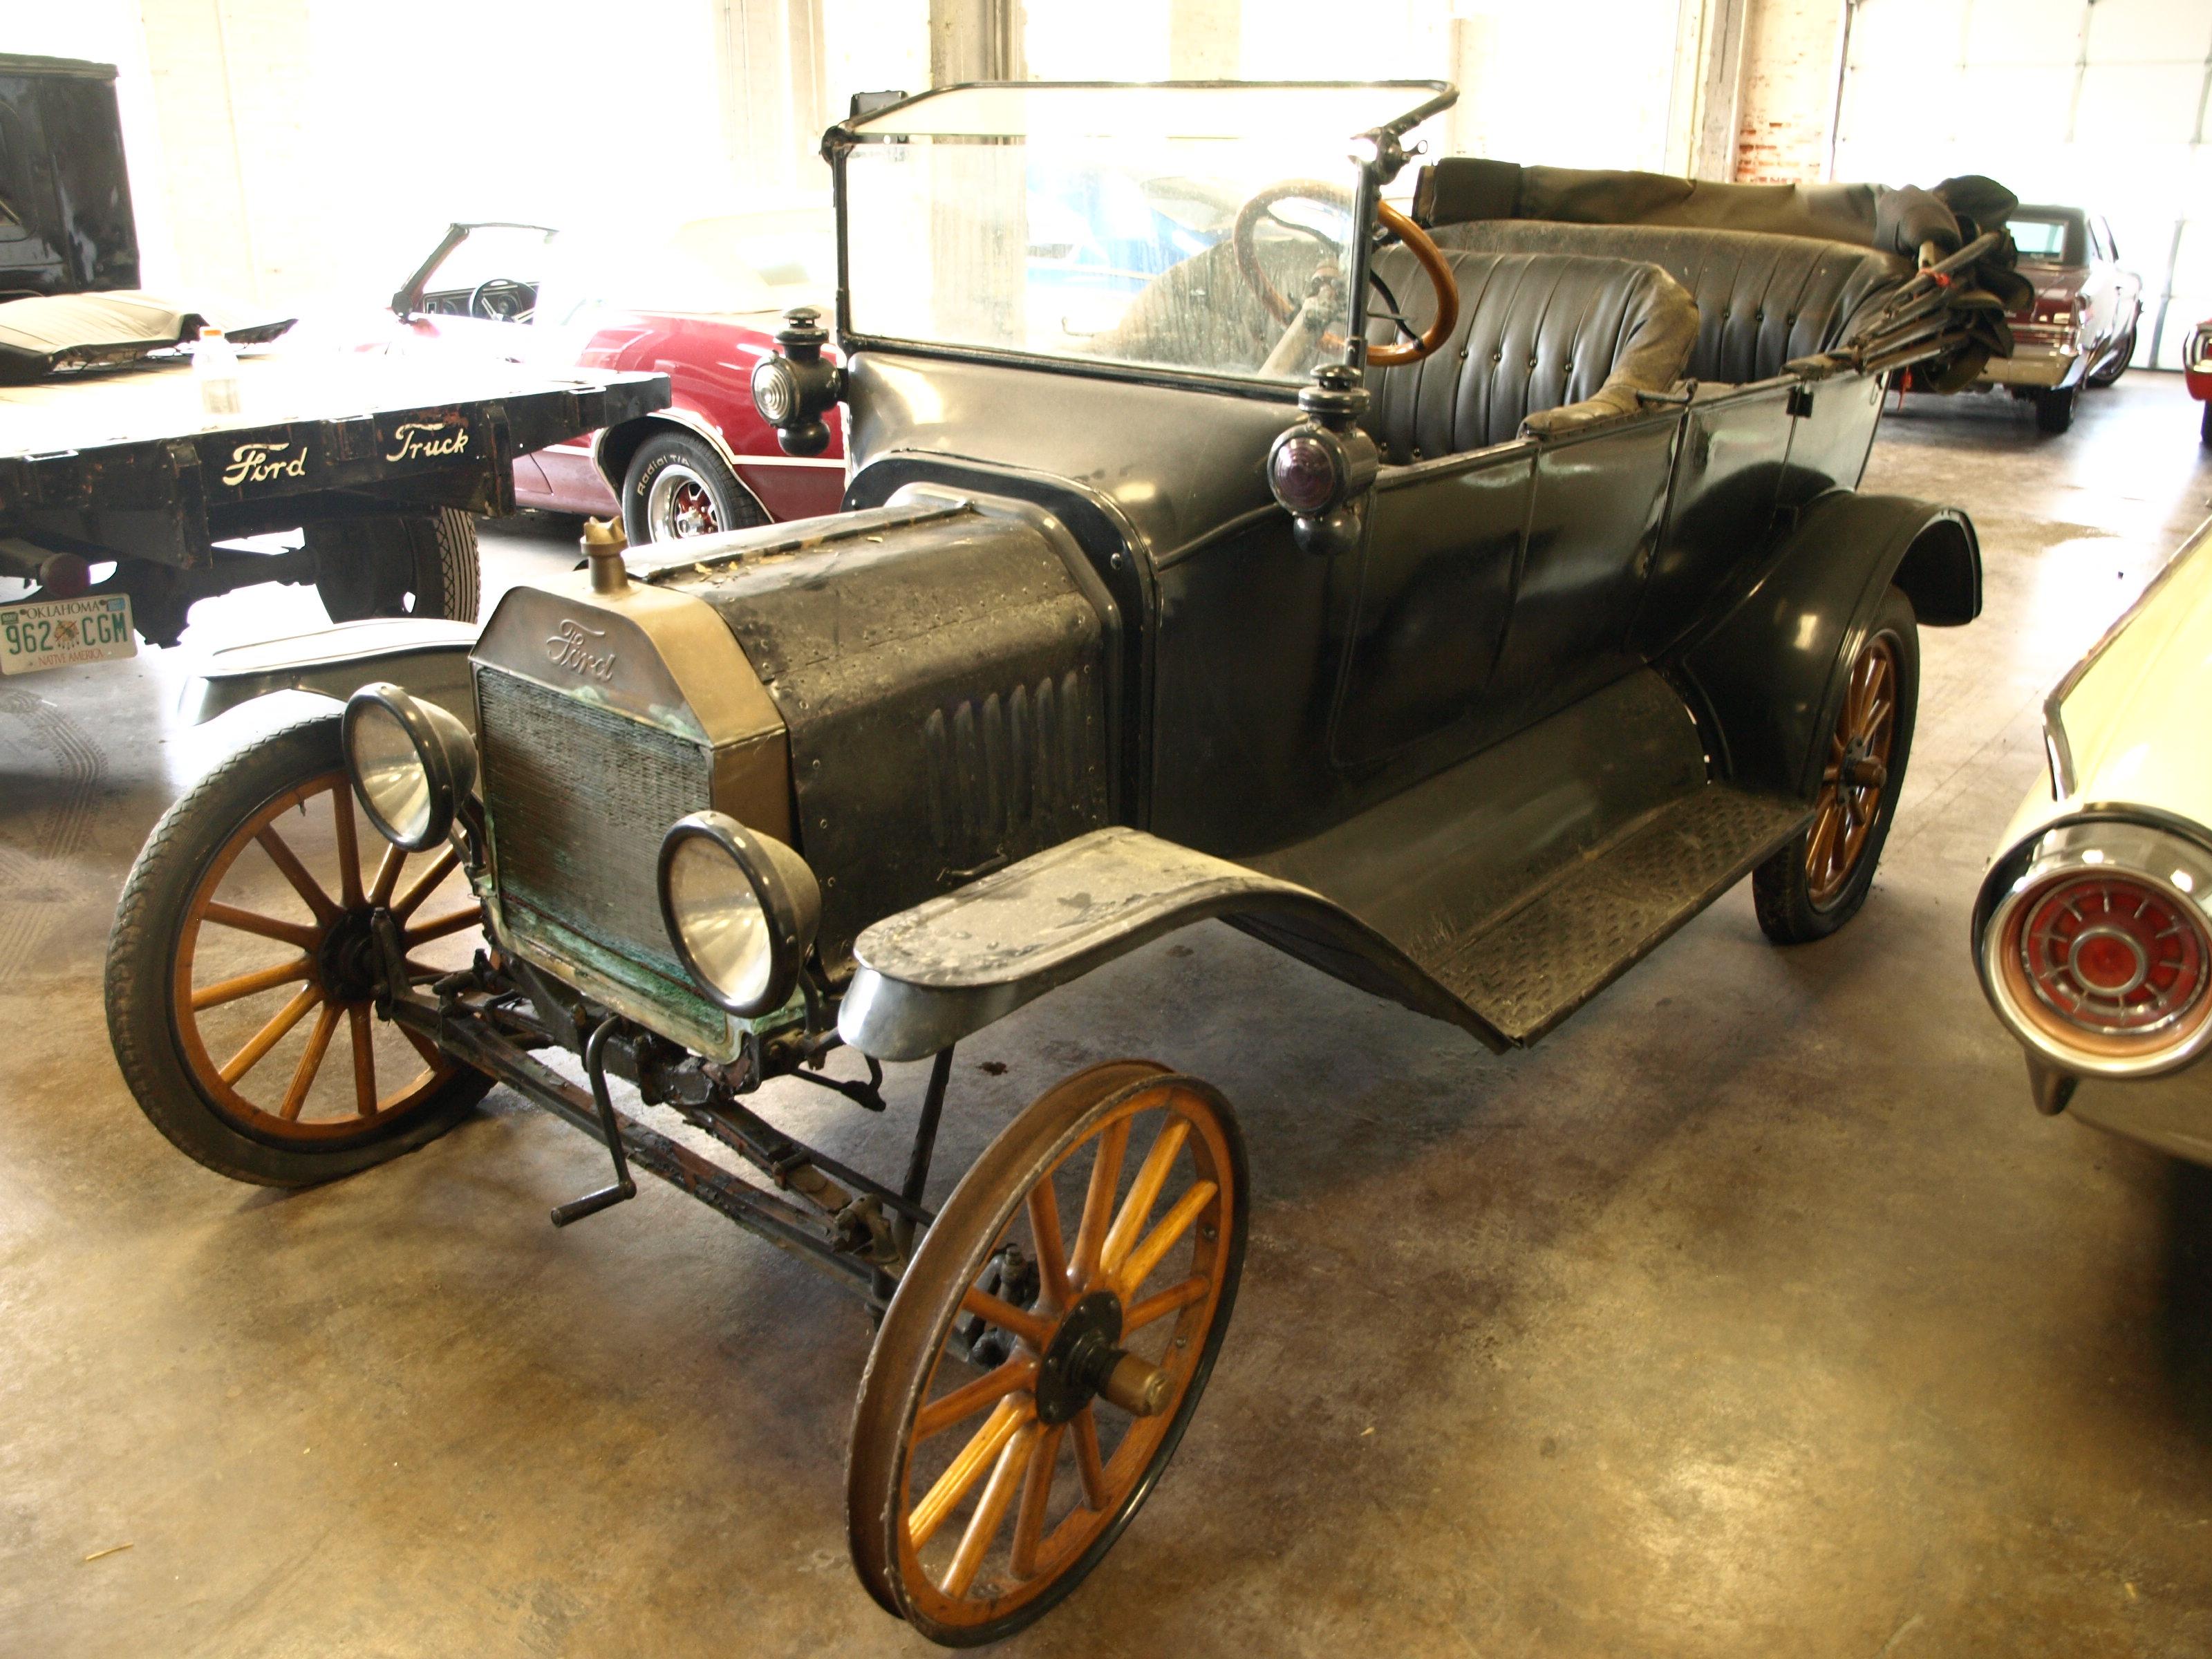 ... 1916 Ford Model T & 1916 Ford Model T - Precision Car Restoration markmcfarlin.com